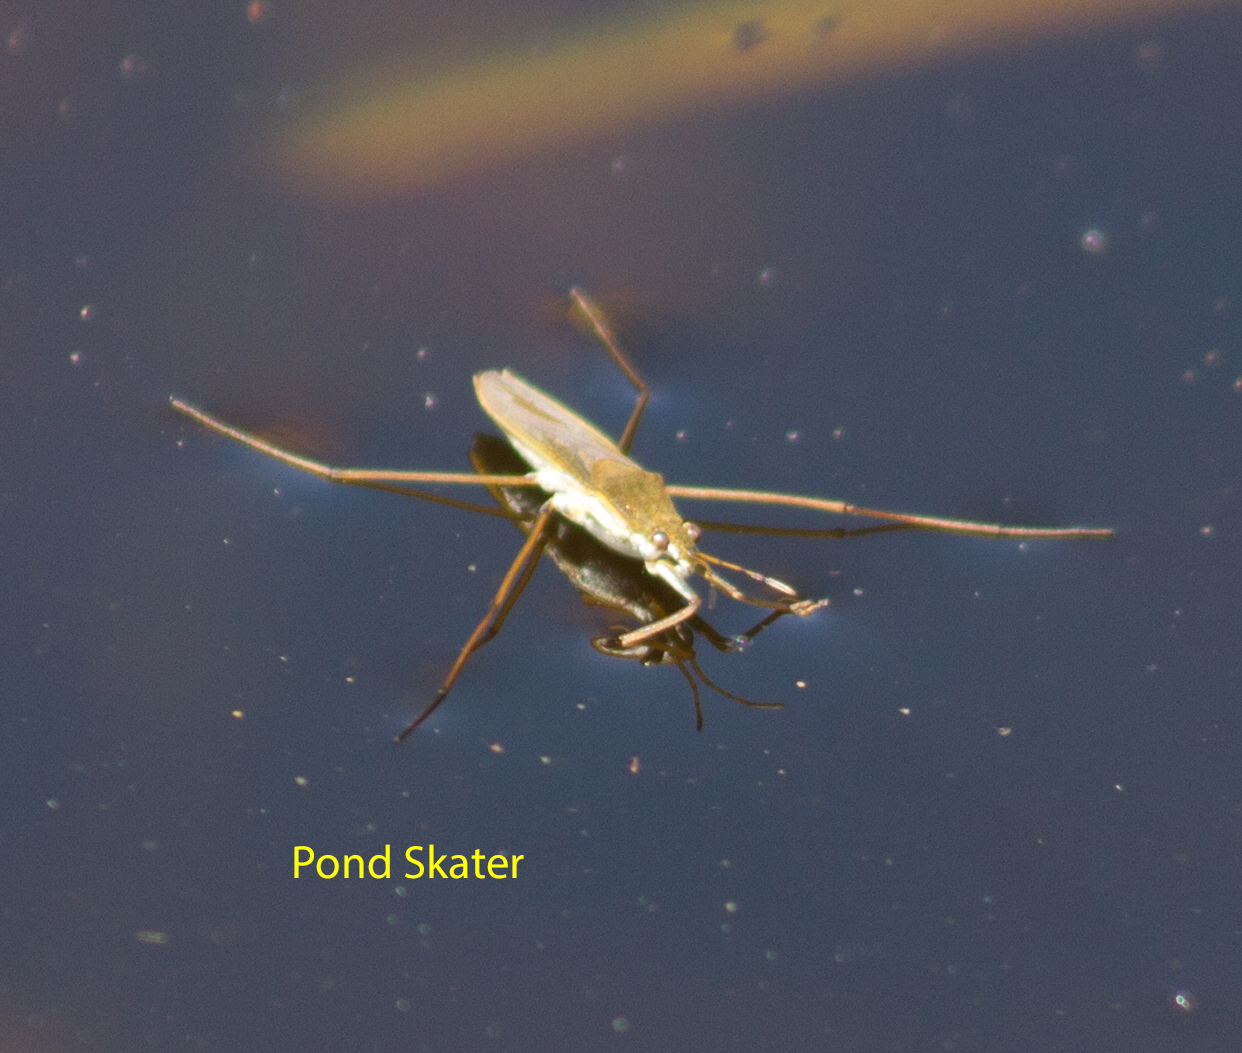 028-pond-skater1-1-5c38b3677f61519ae04d9d3341a9682ab90fbdf1